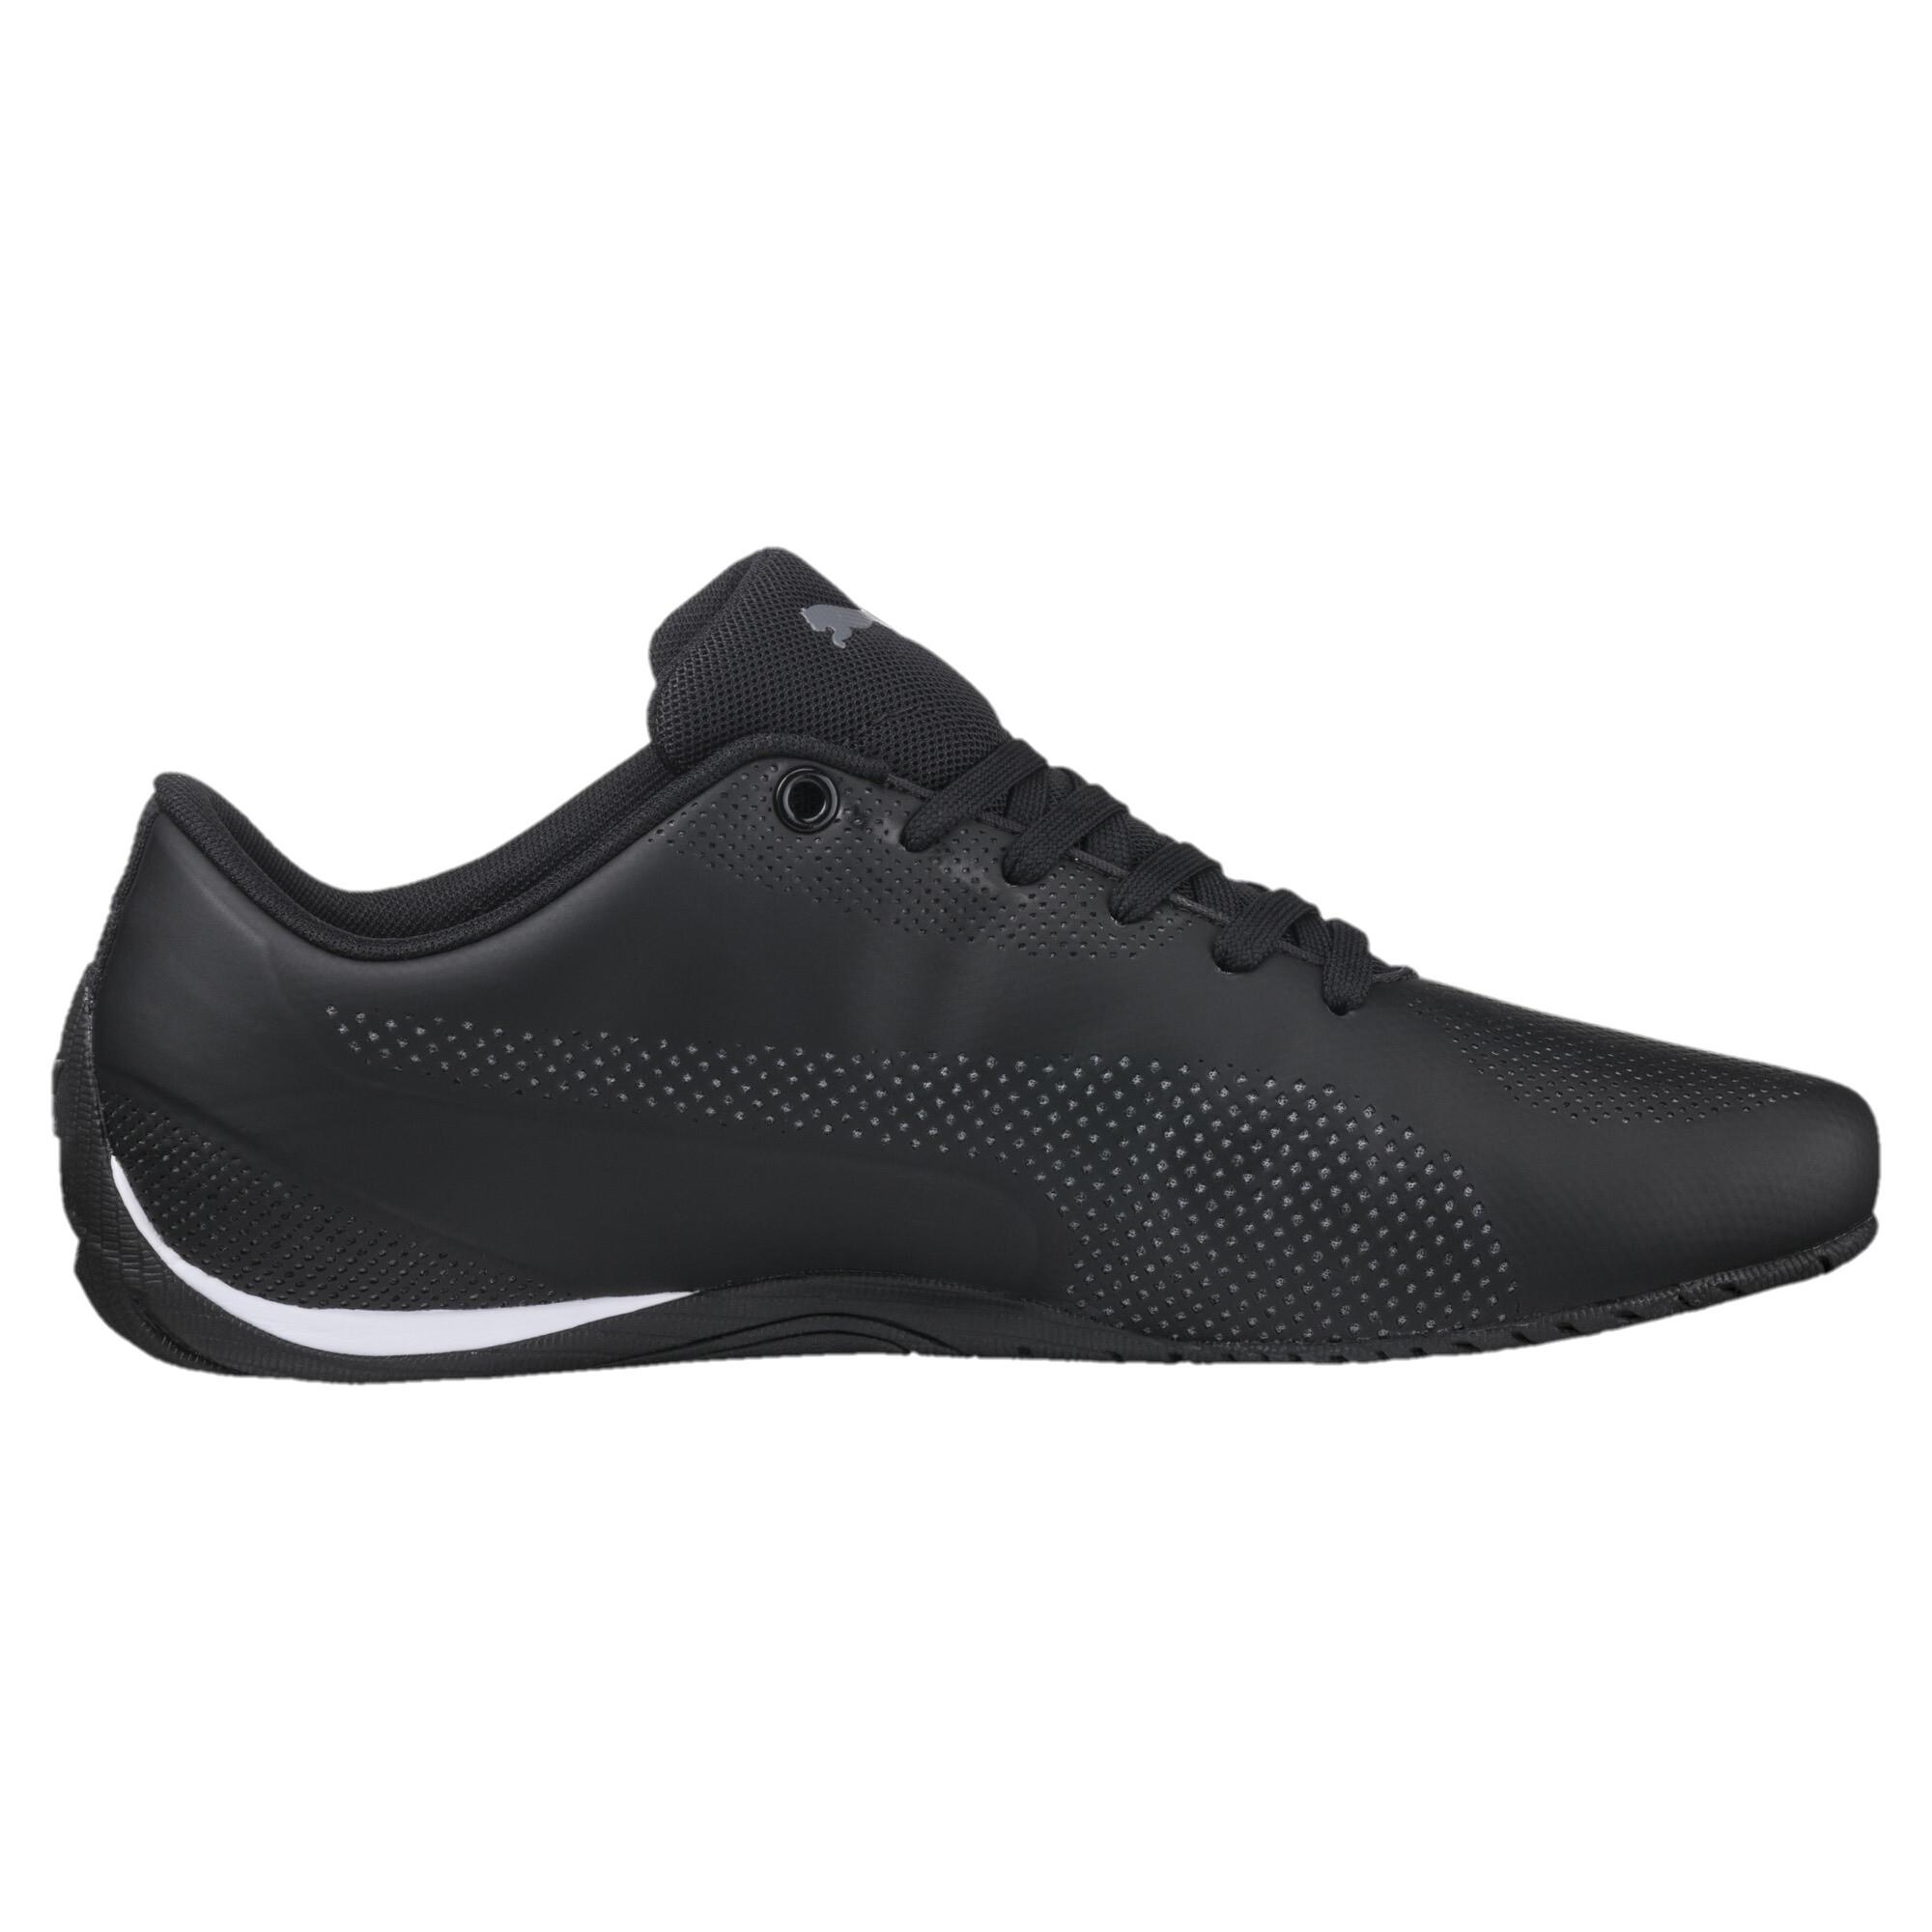 PUMA-Drift-Cat-5-Ultra-Men-s-Shoes-Men-Shoe-Sport-Classics thumbnail 5